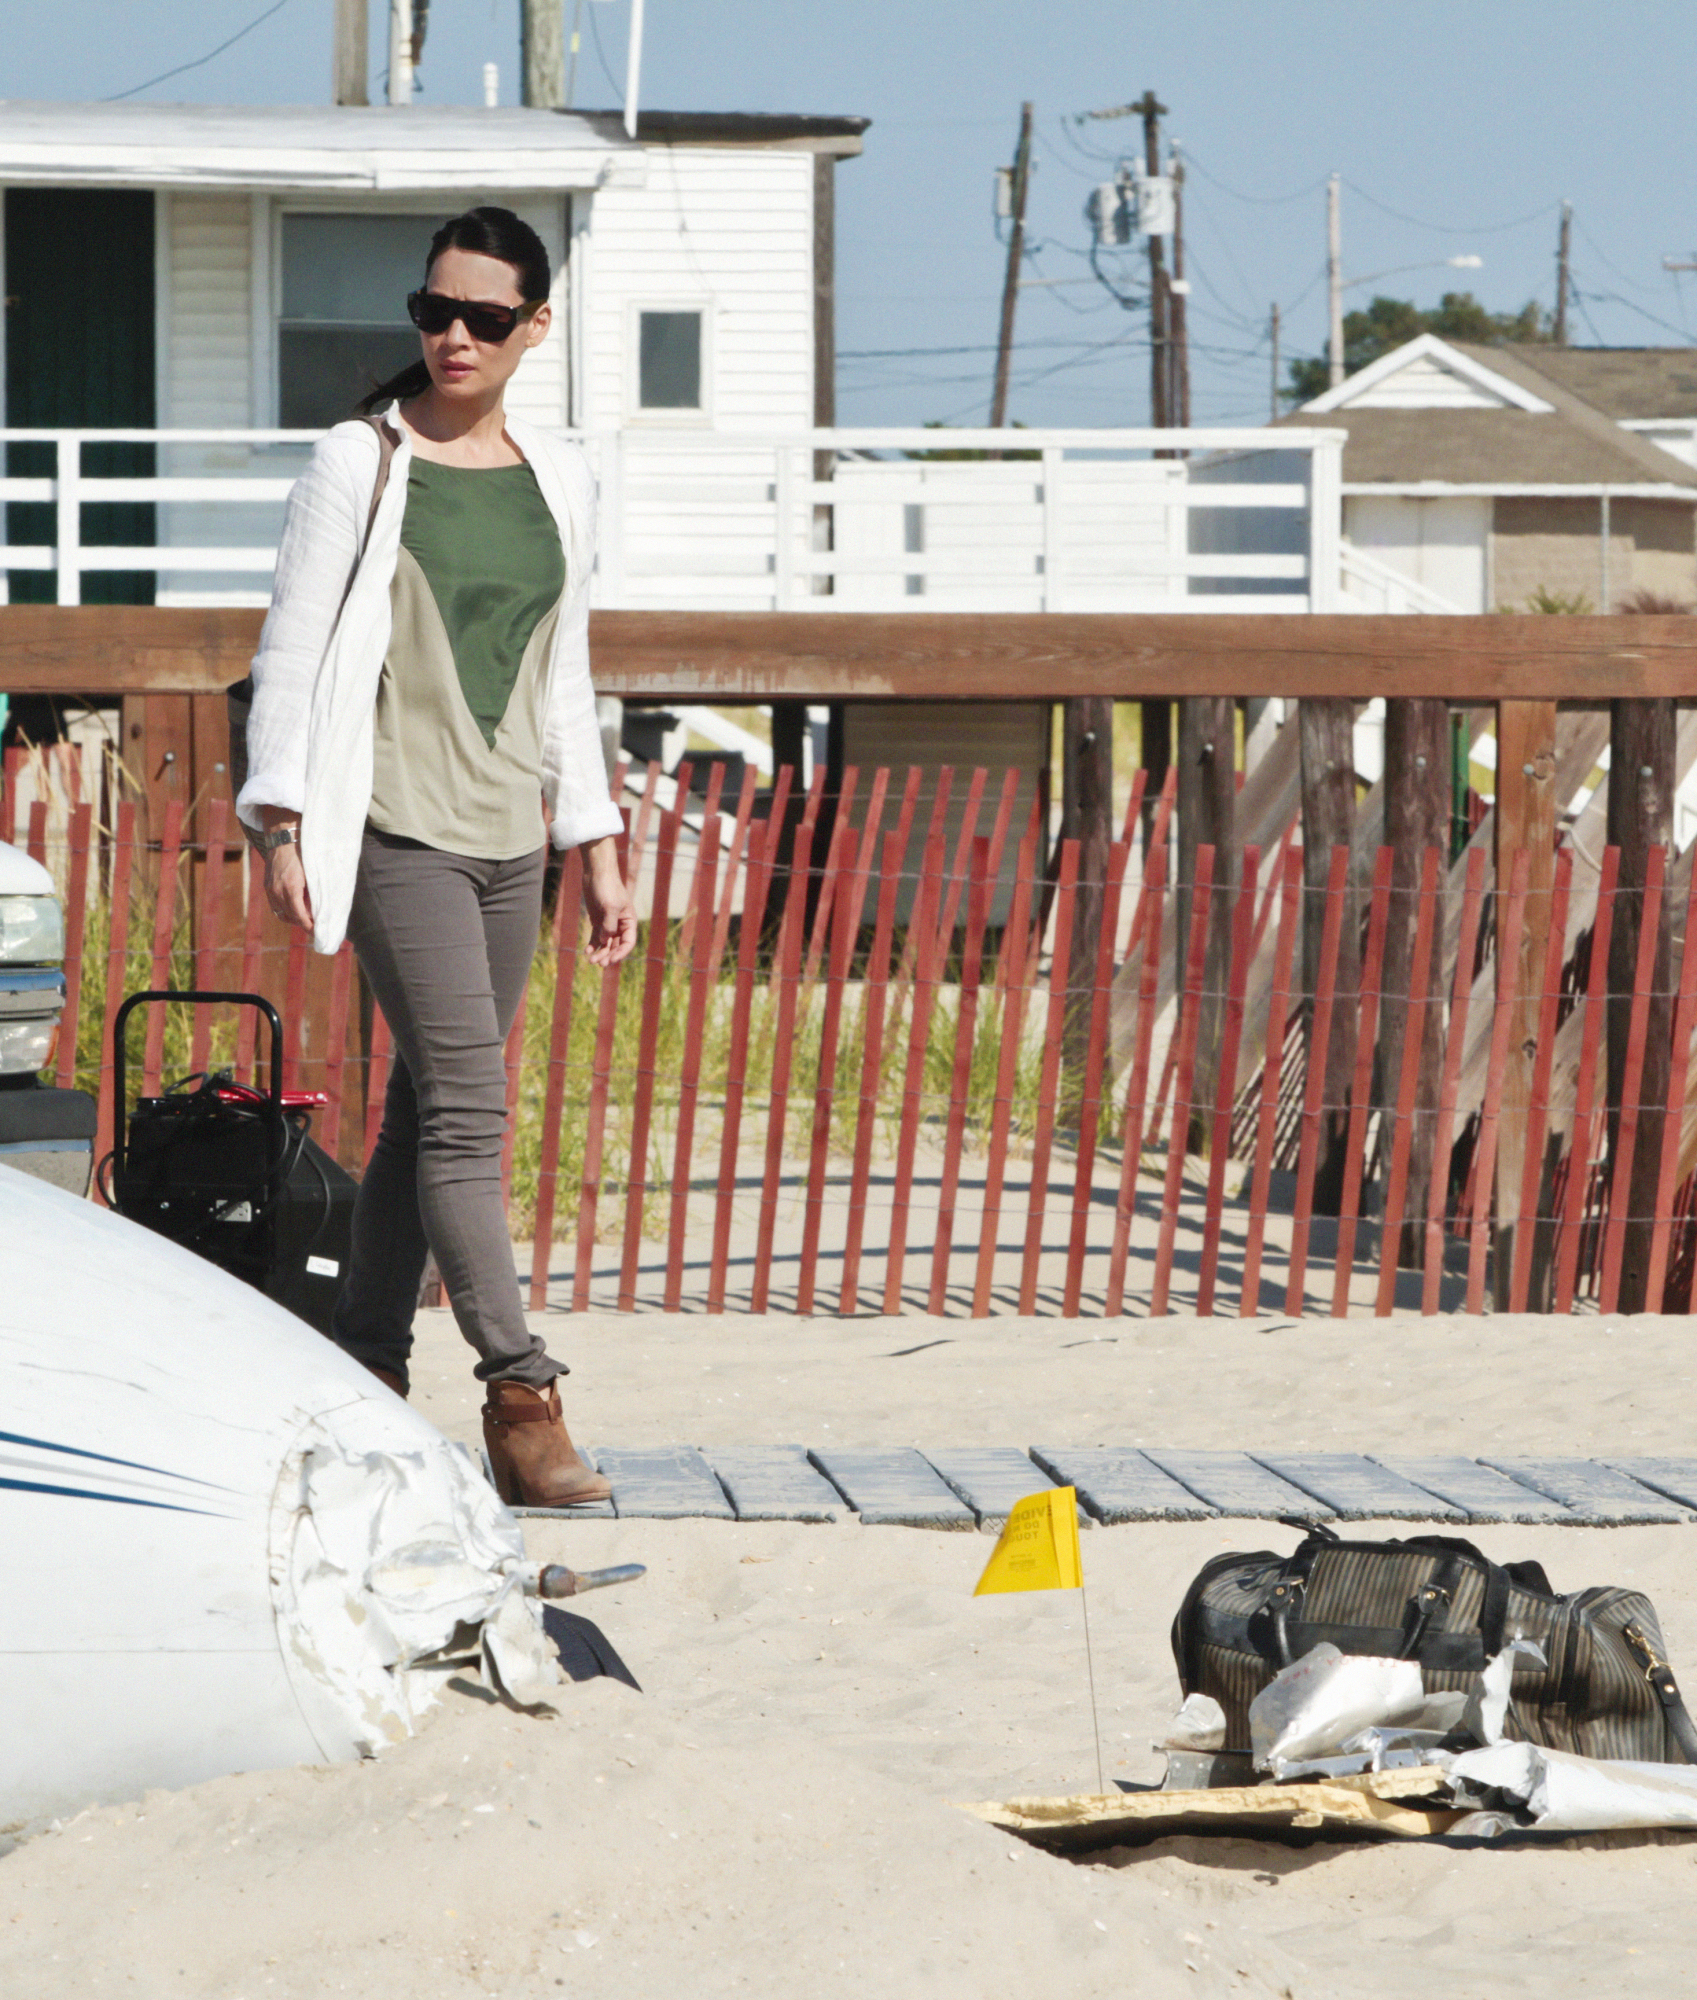 Watson Investigates On the Beach